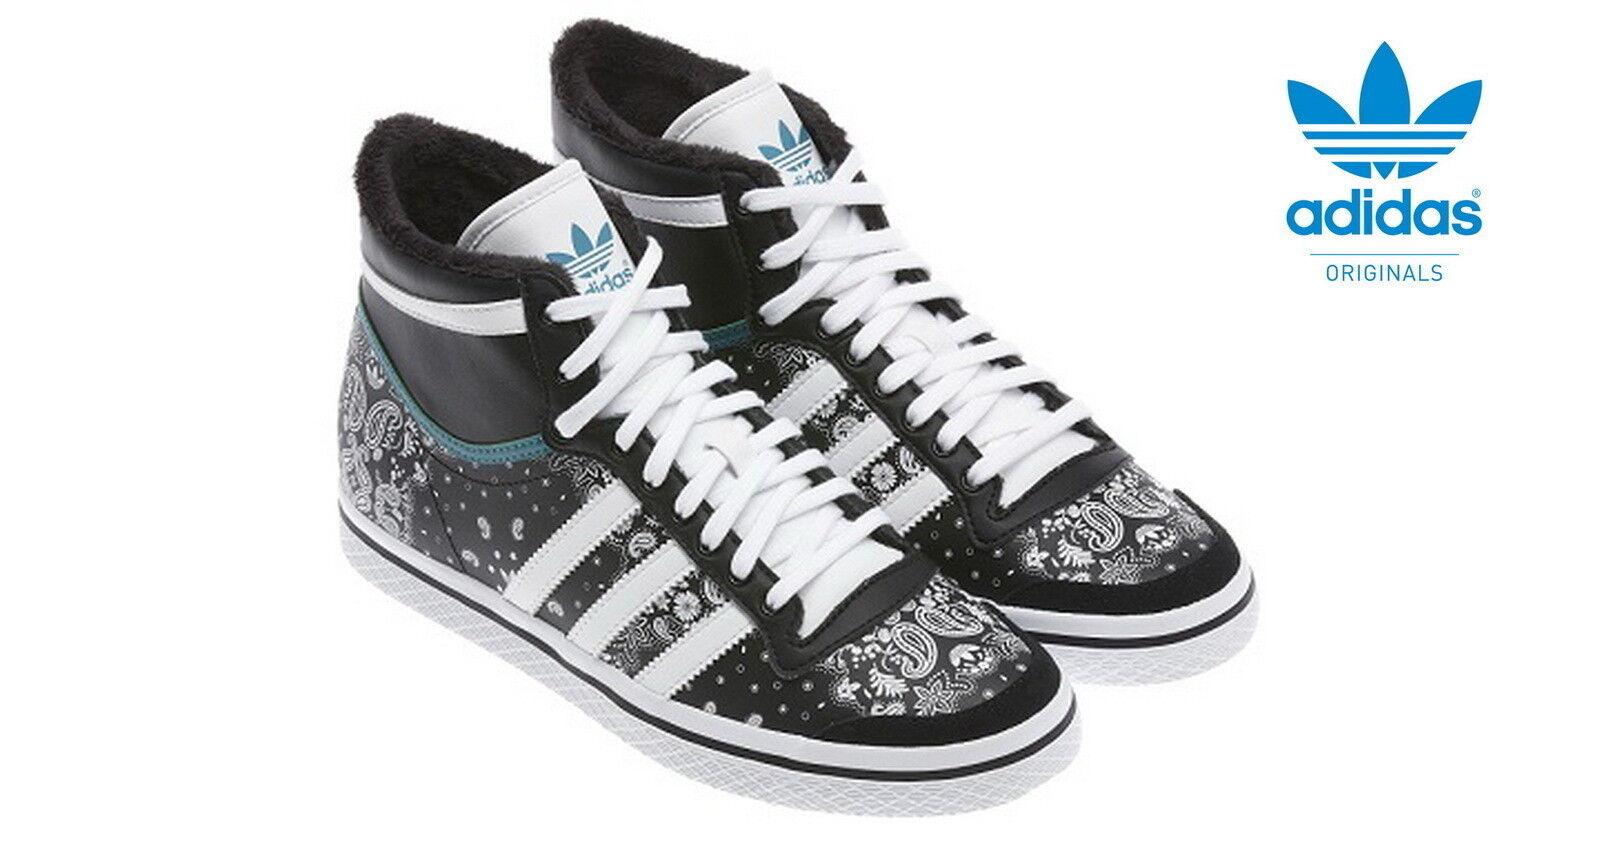 Adidas Top Ten Hi Originals Damen Turnschuhe Turnschuhe G95446 Neues Design